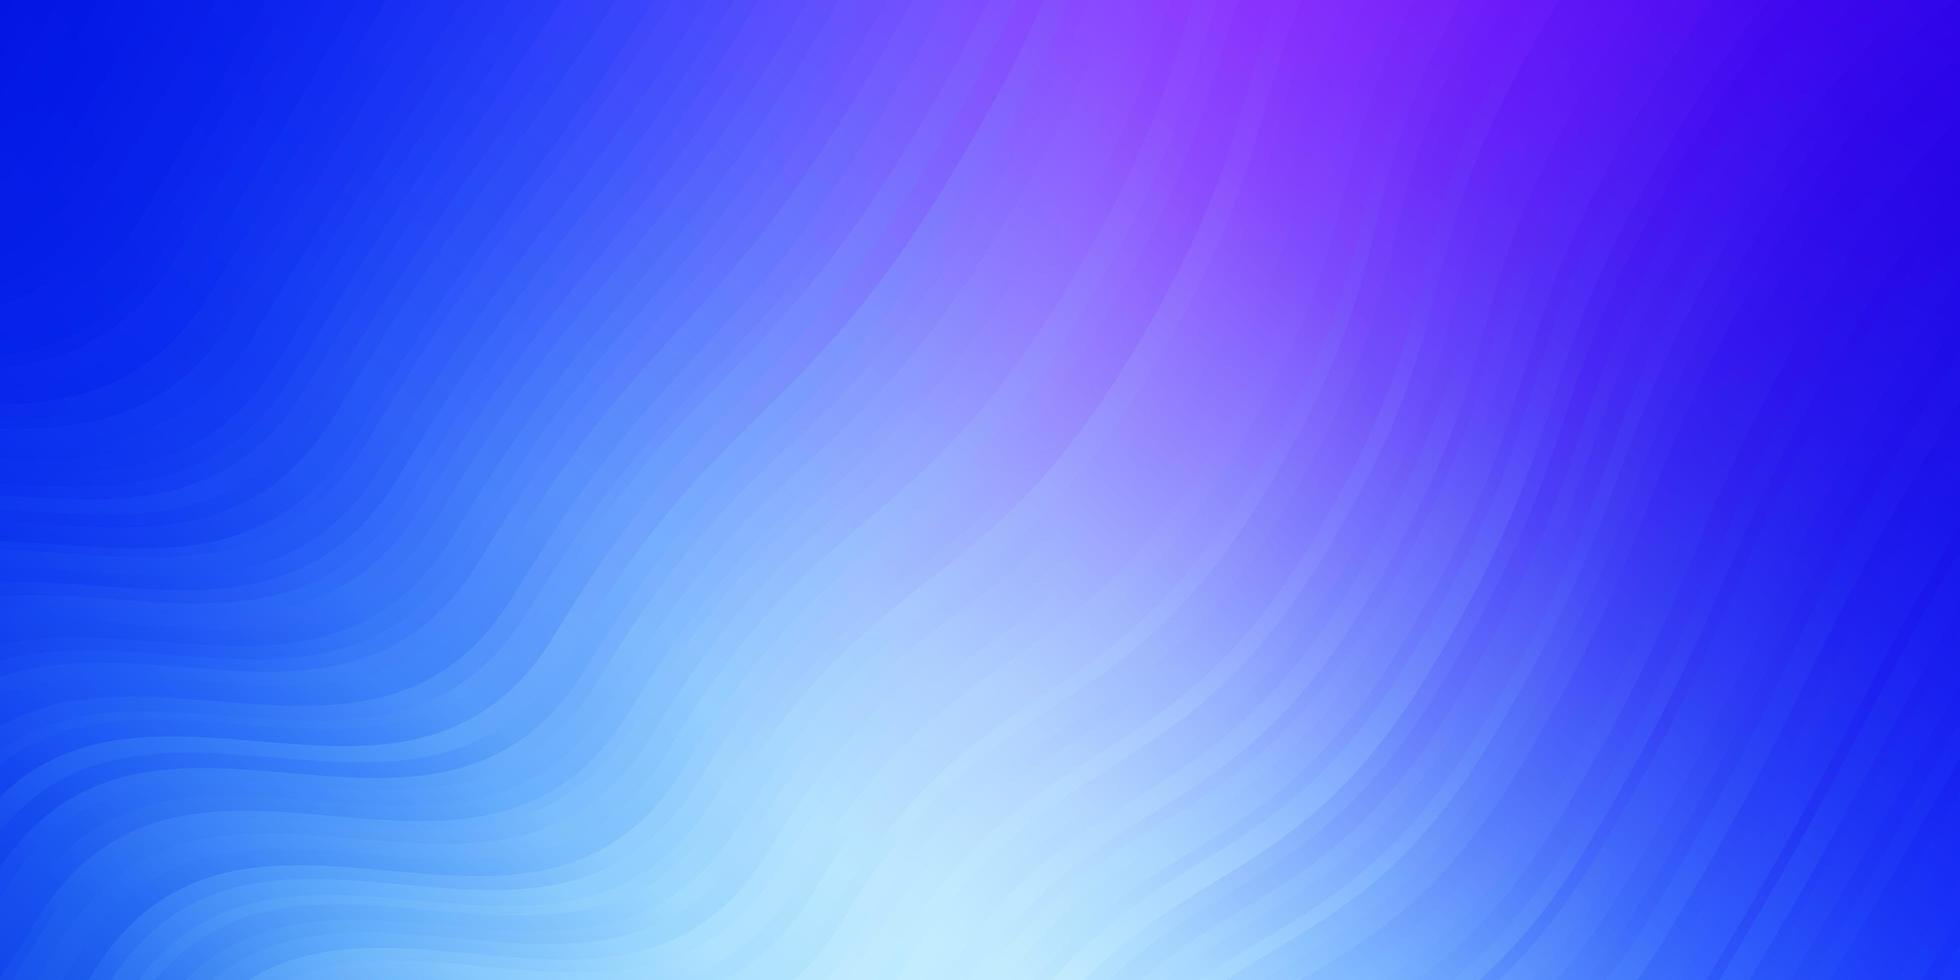 patrón de vector rosa claro, azul con líneas curvas.